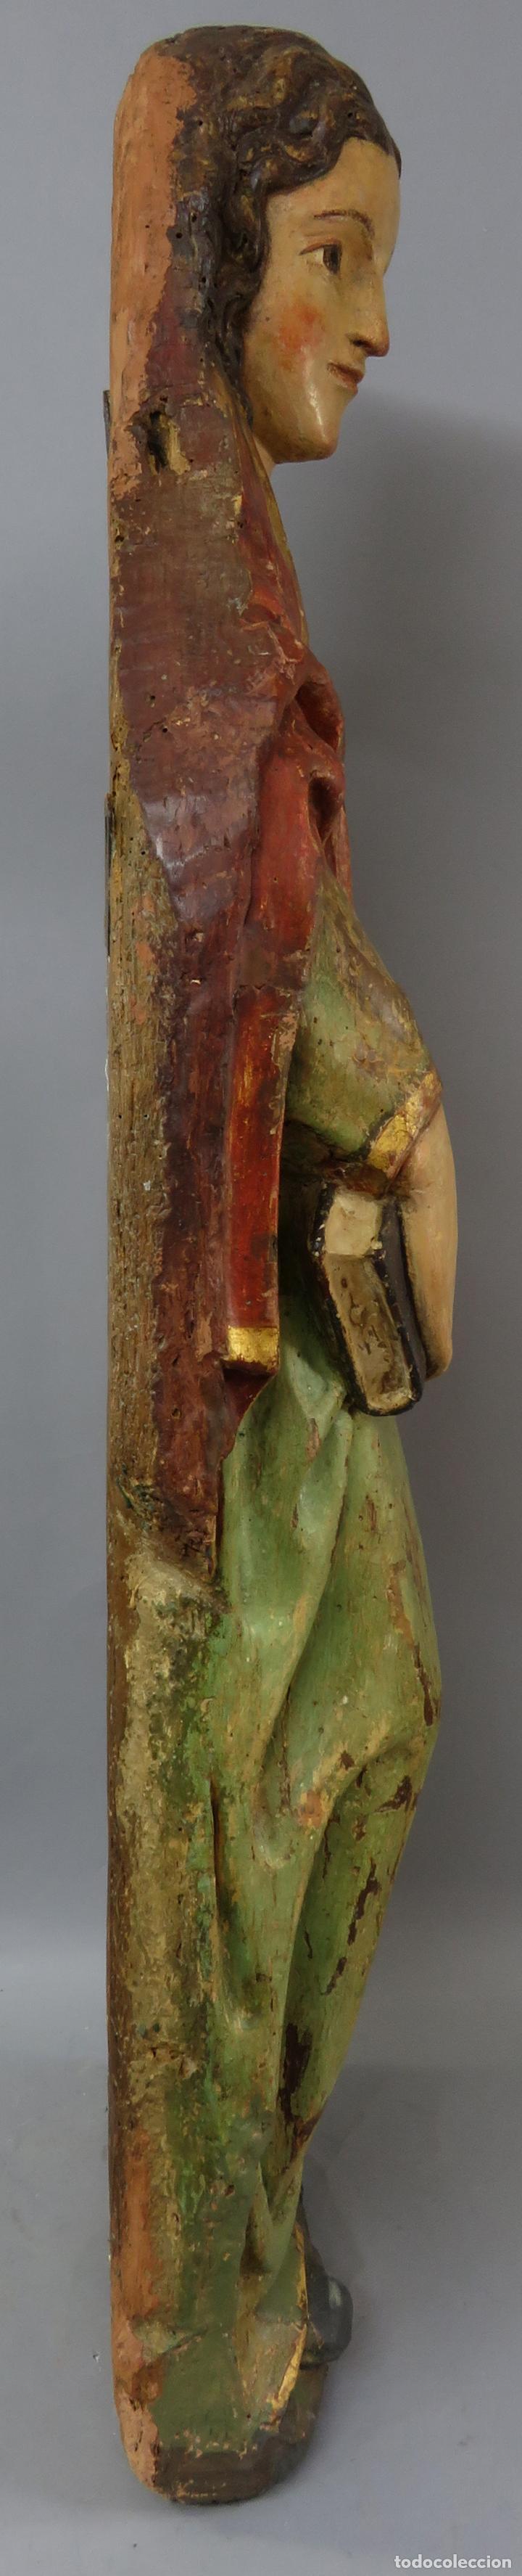 Arte: Talla de medio bulto o chuleta San Juan Evangelista madera tallada dorada y policromada XVI XVII - Foto 31 - 221922775